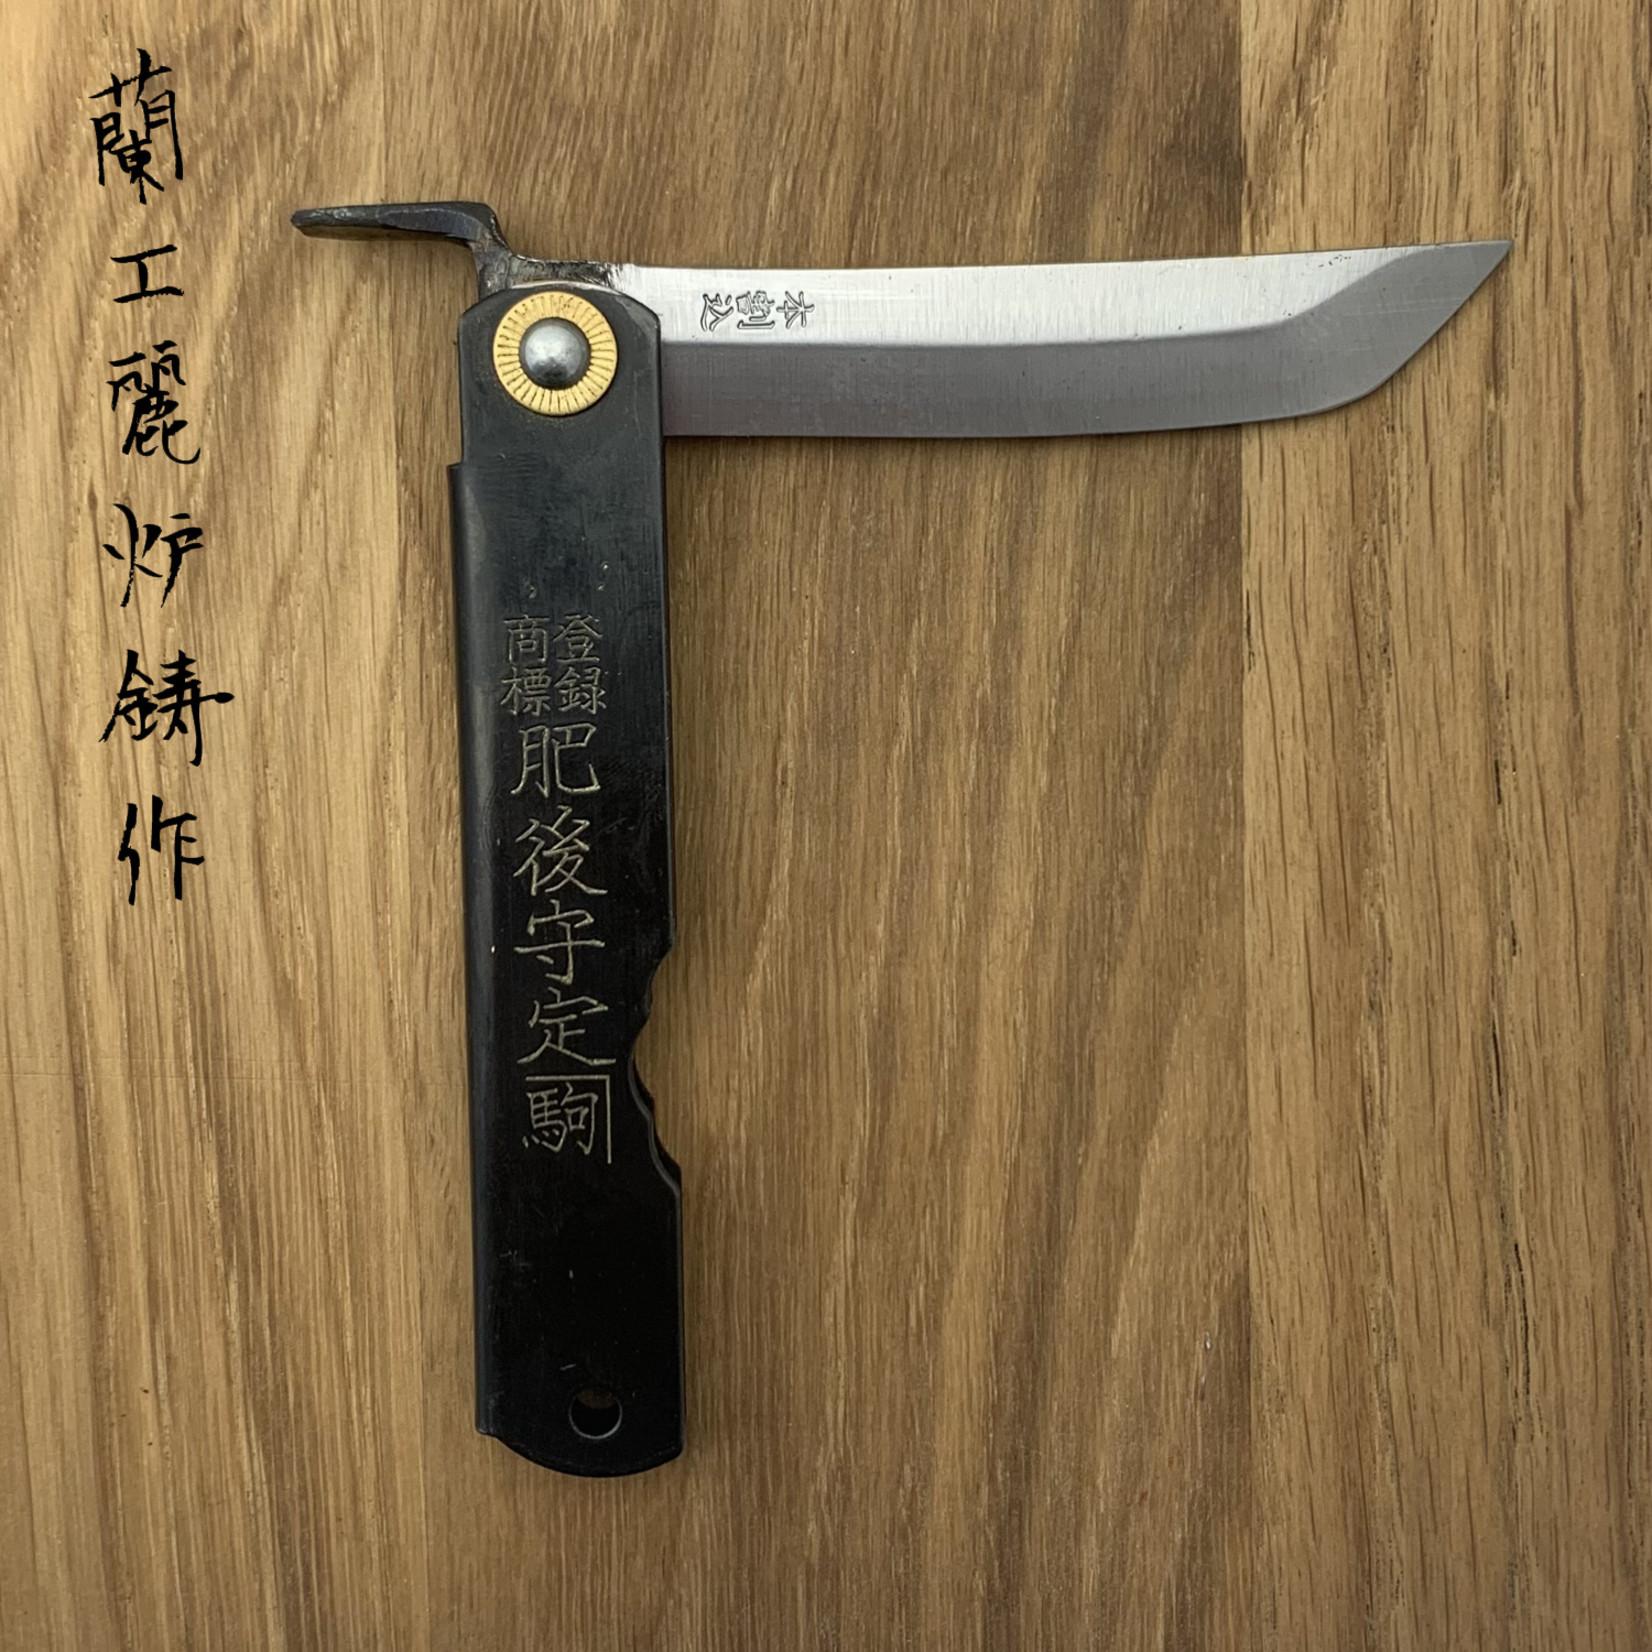 Higonokami Ken-gata Blue steel Core 70 mm Black 13BK